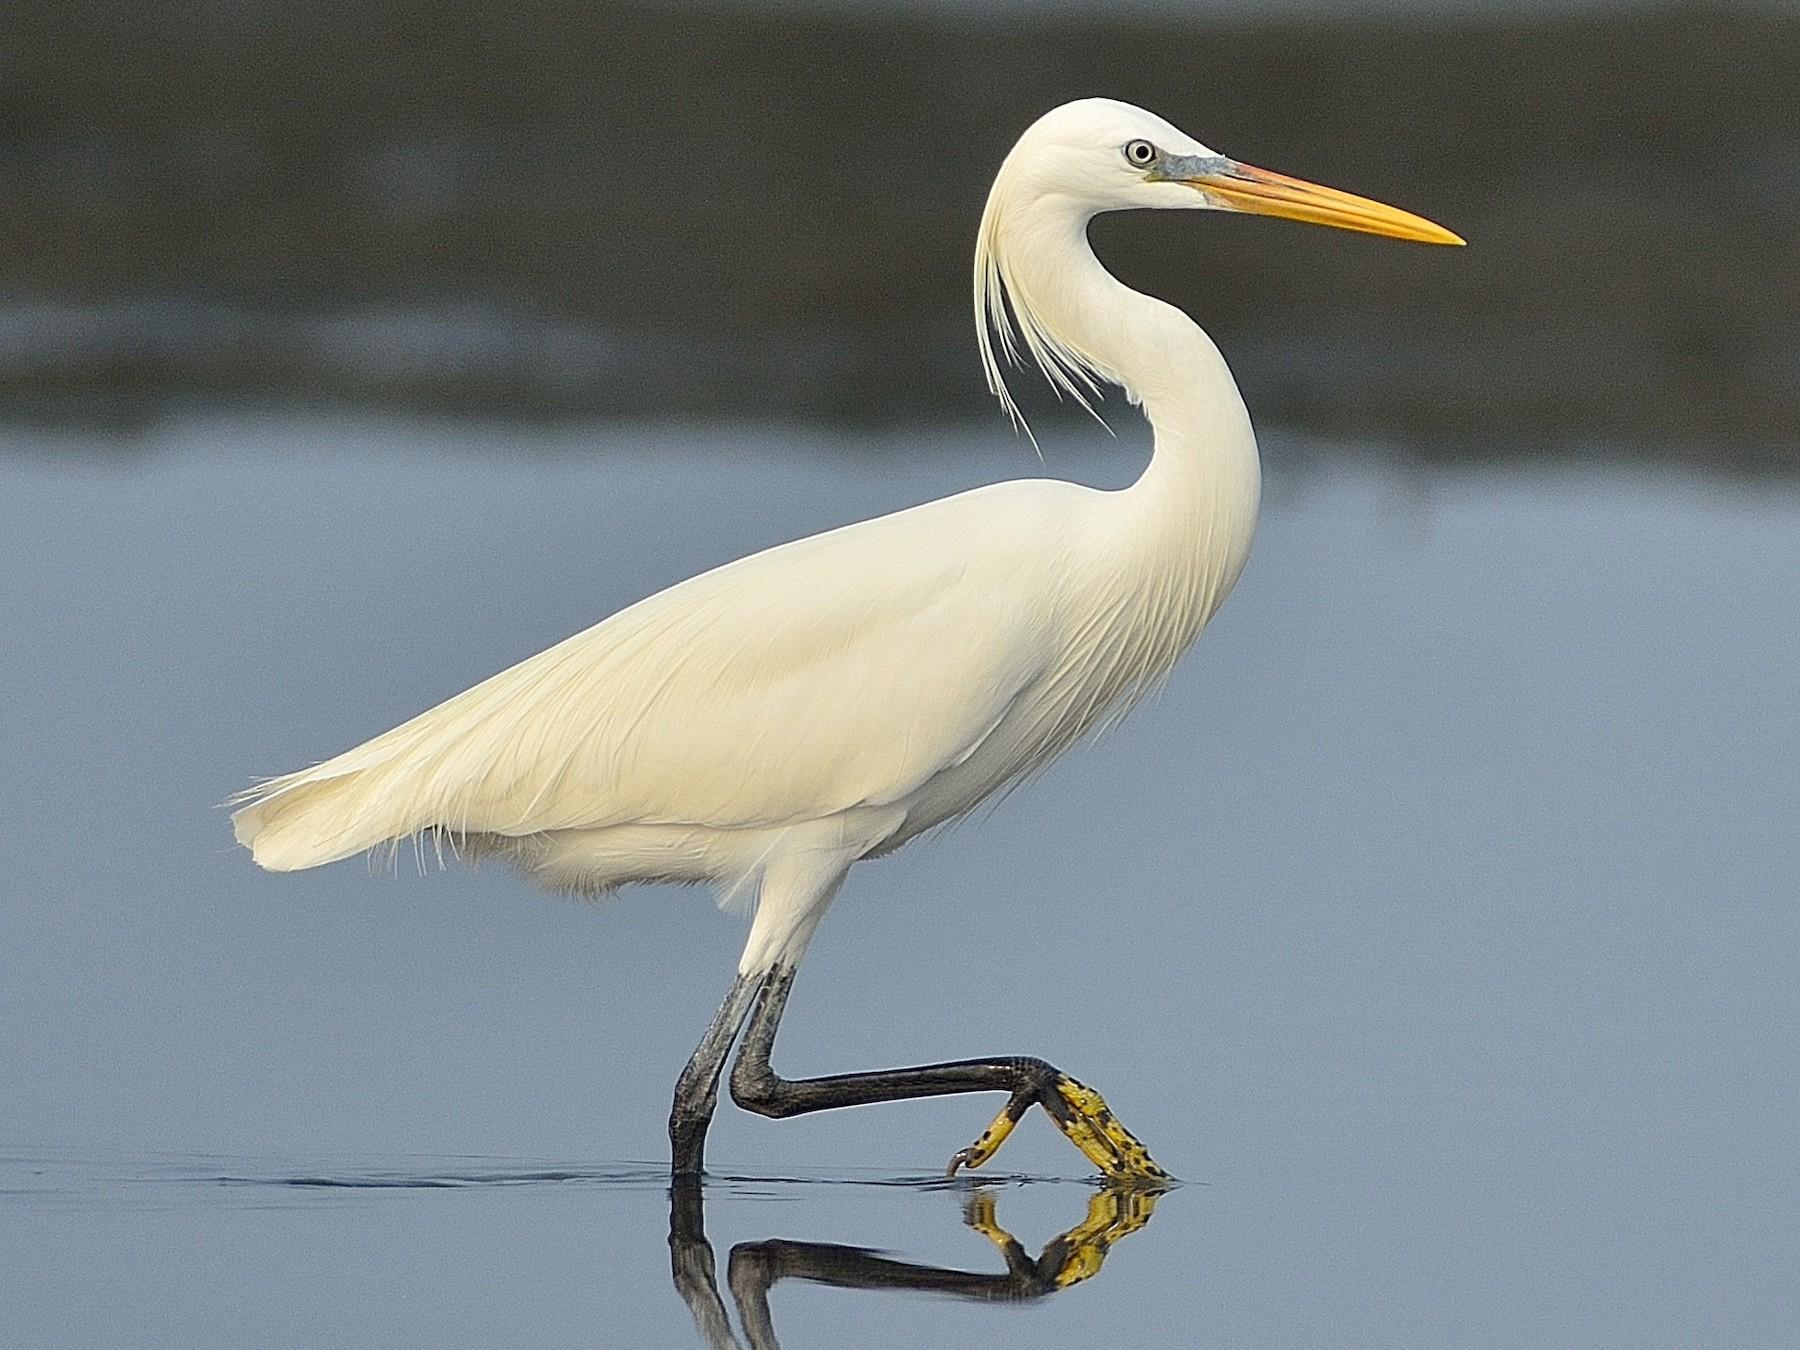 Chinese Egret - Wbird Tsai